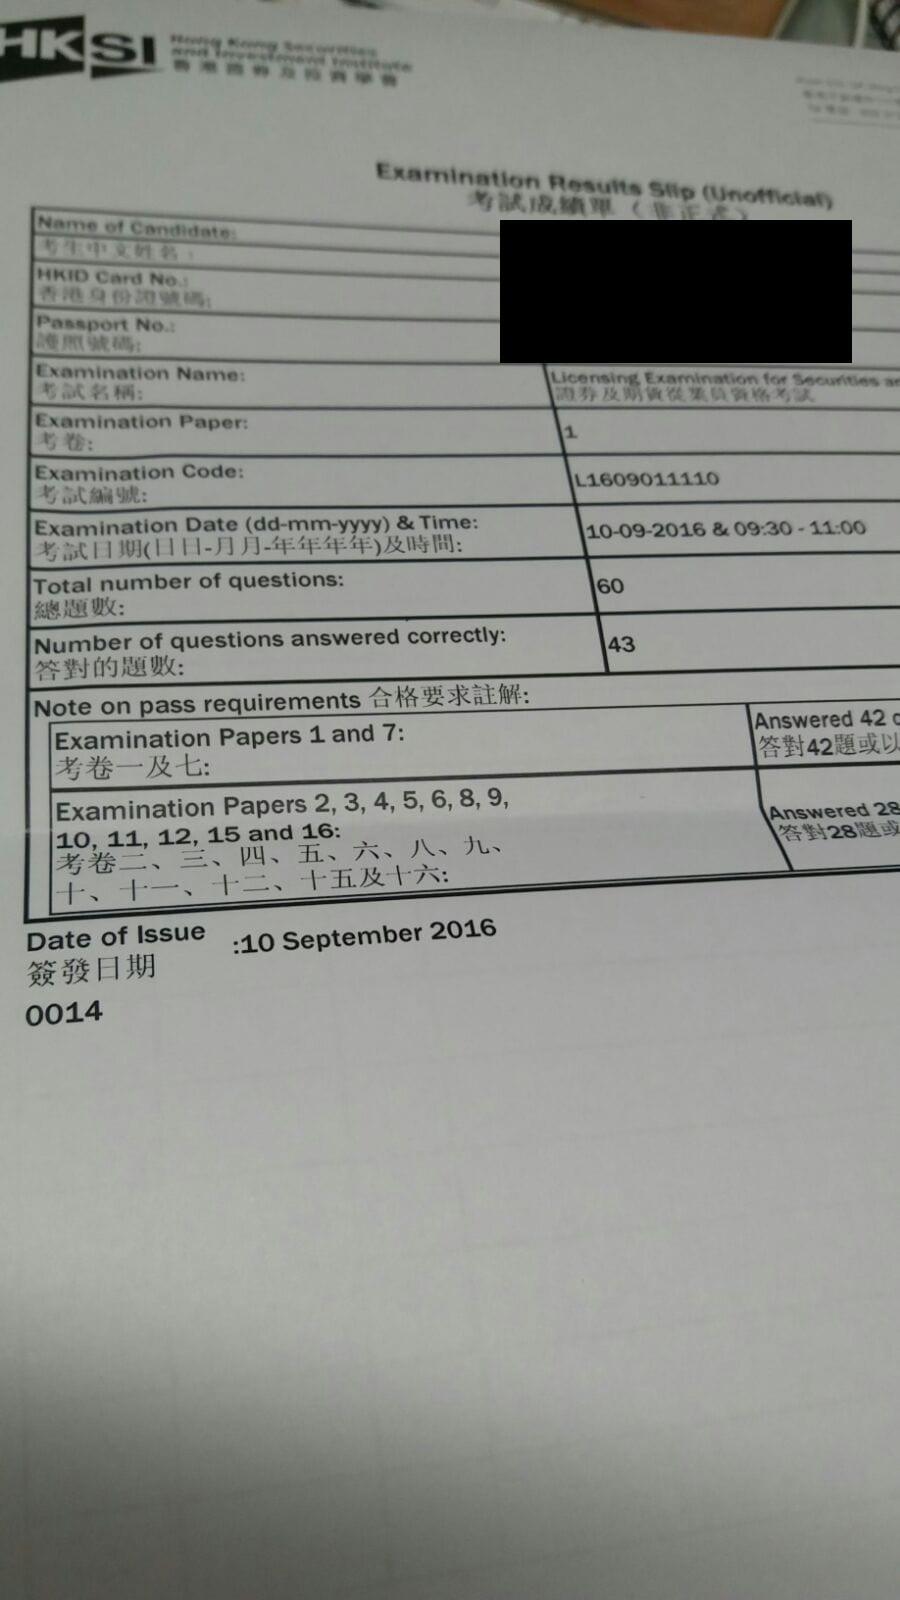 YKW 10/9/2016 LE Paper 1 證券期貨從業員資格考試卷一 Pass